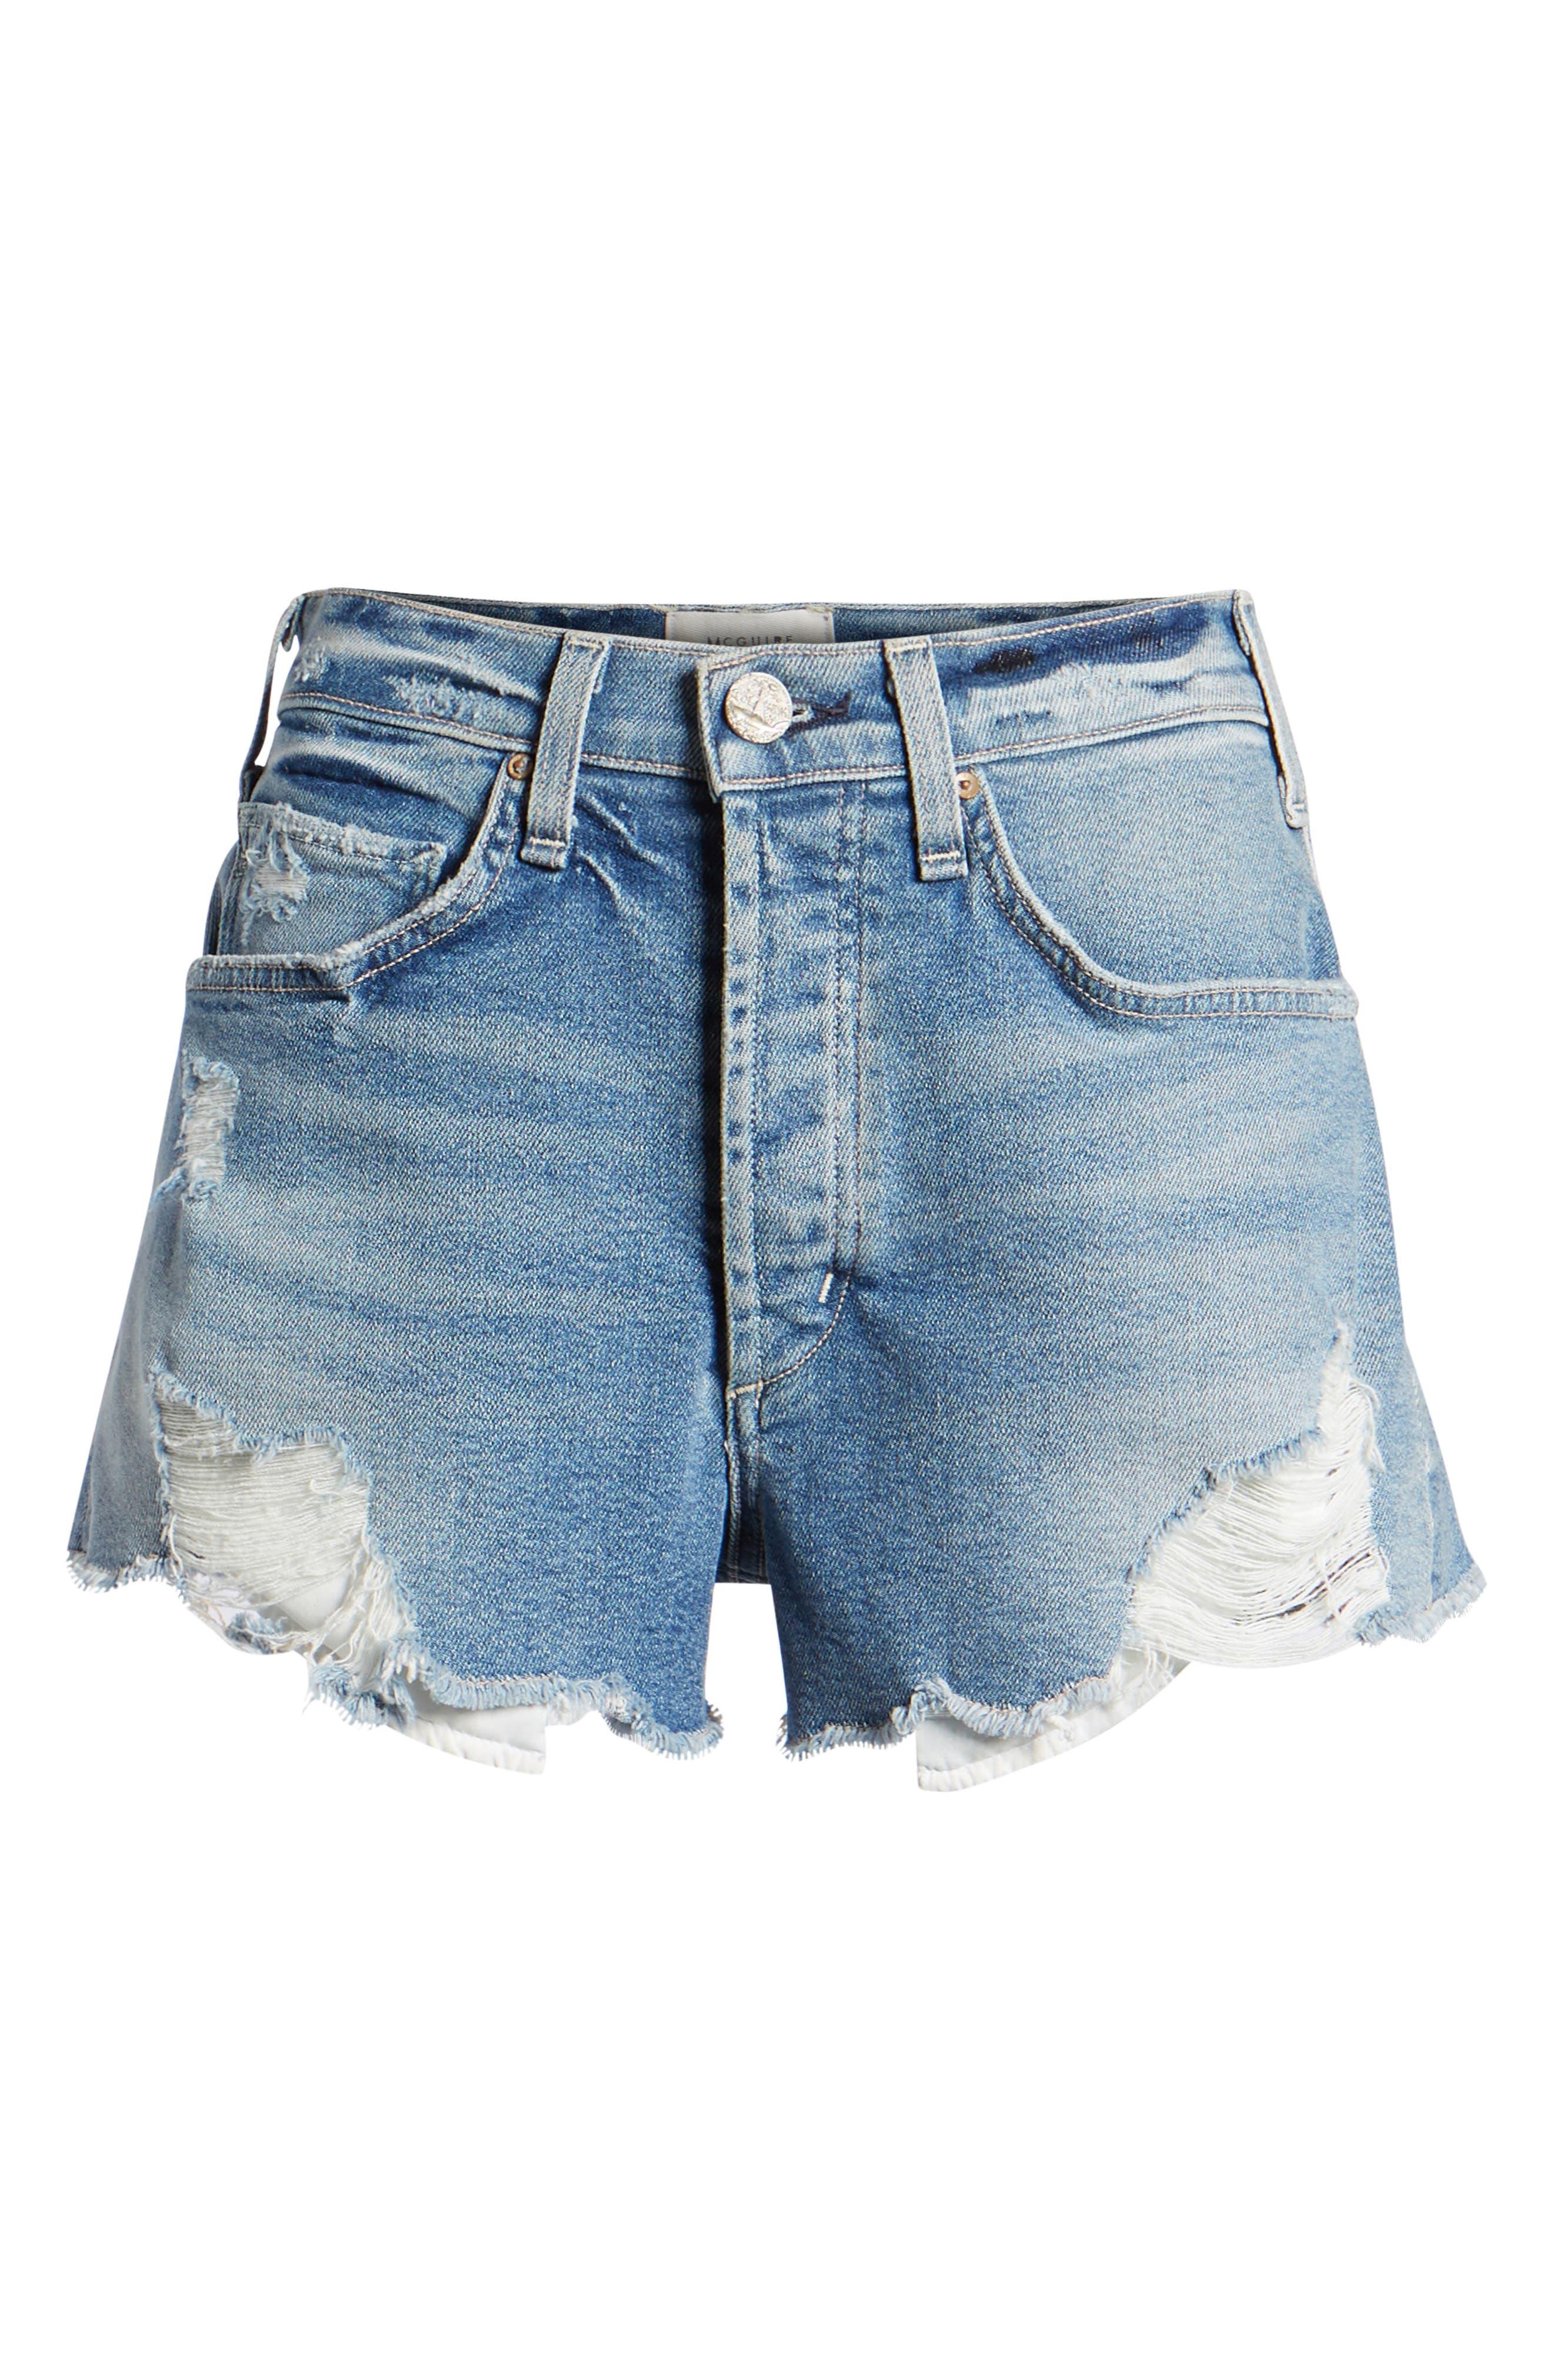 Georgia May Distressed Denim Shorts,                             Alternate thumbnail 7, color,                             450